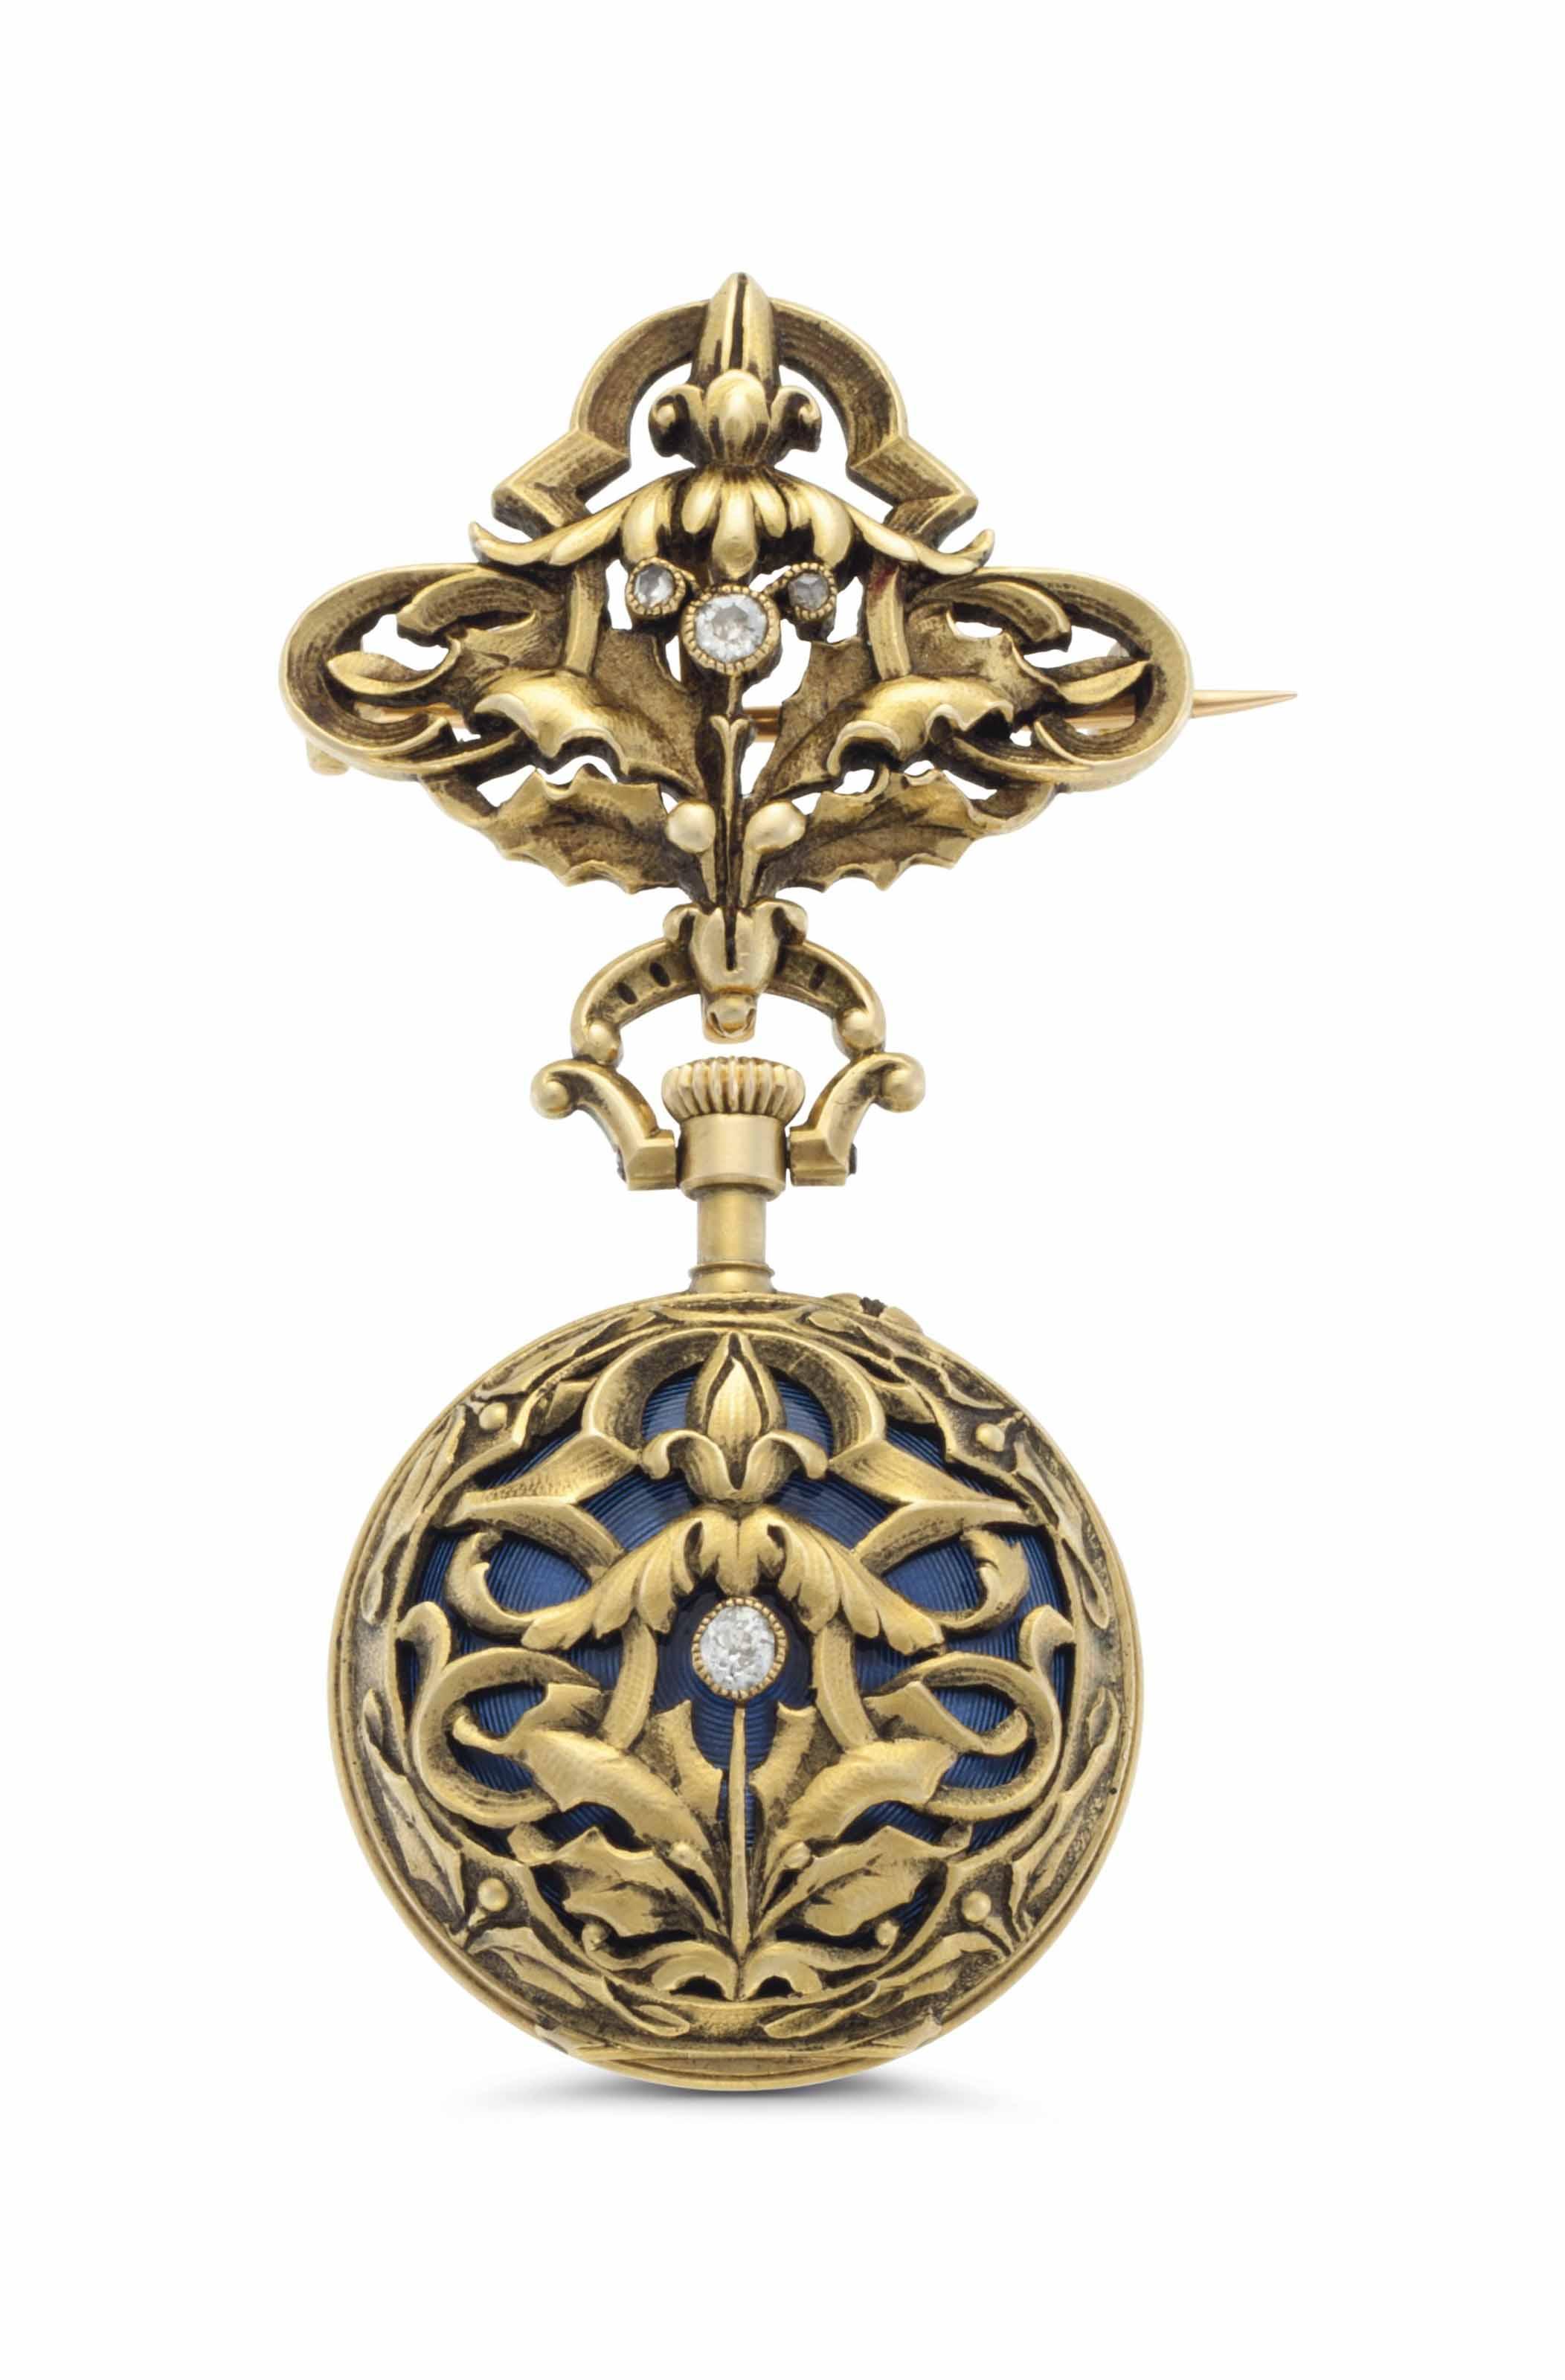 Swiss. A Lady's 18k Gold, Enamel and Diamond-set Openface Keyless Lever Pendant Watch